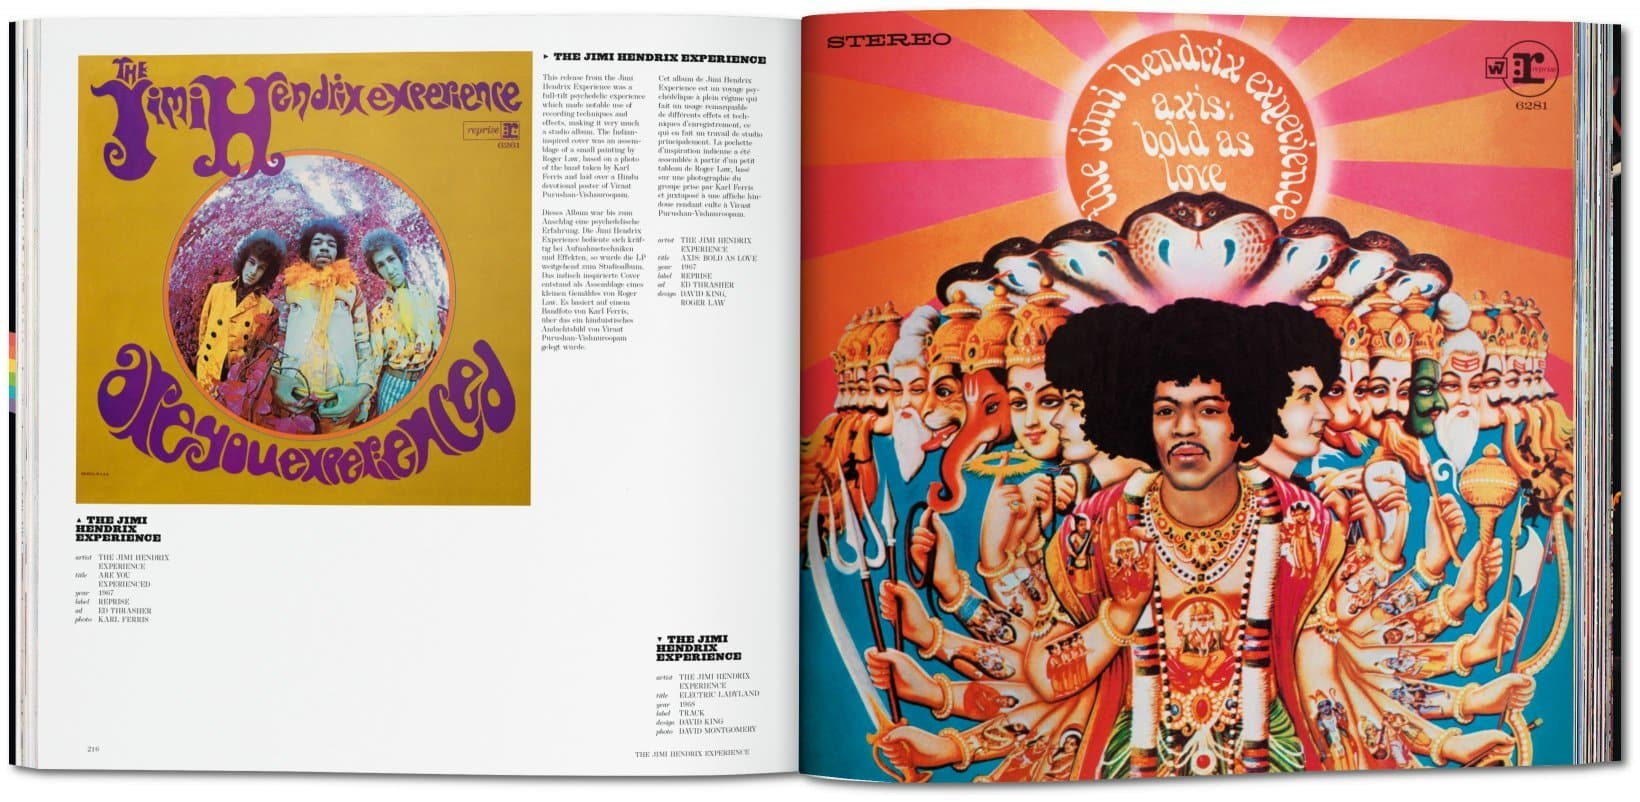 covers livre rock album musique art taschen photography